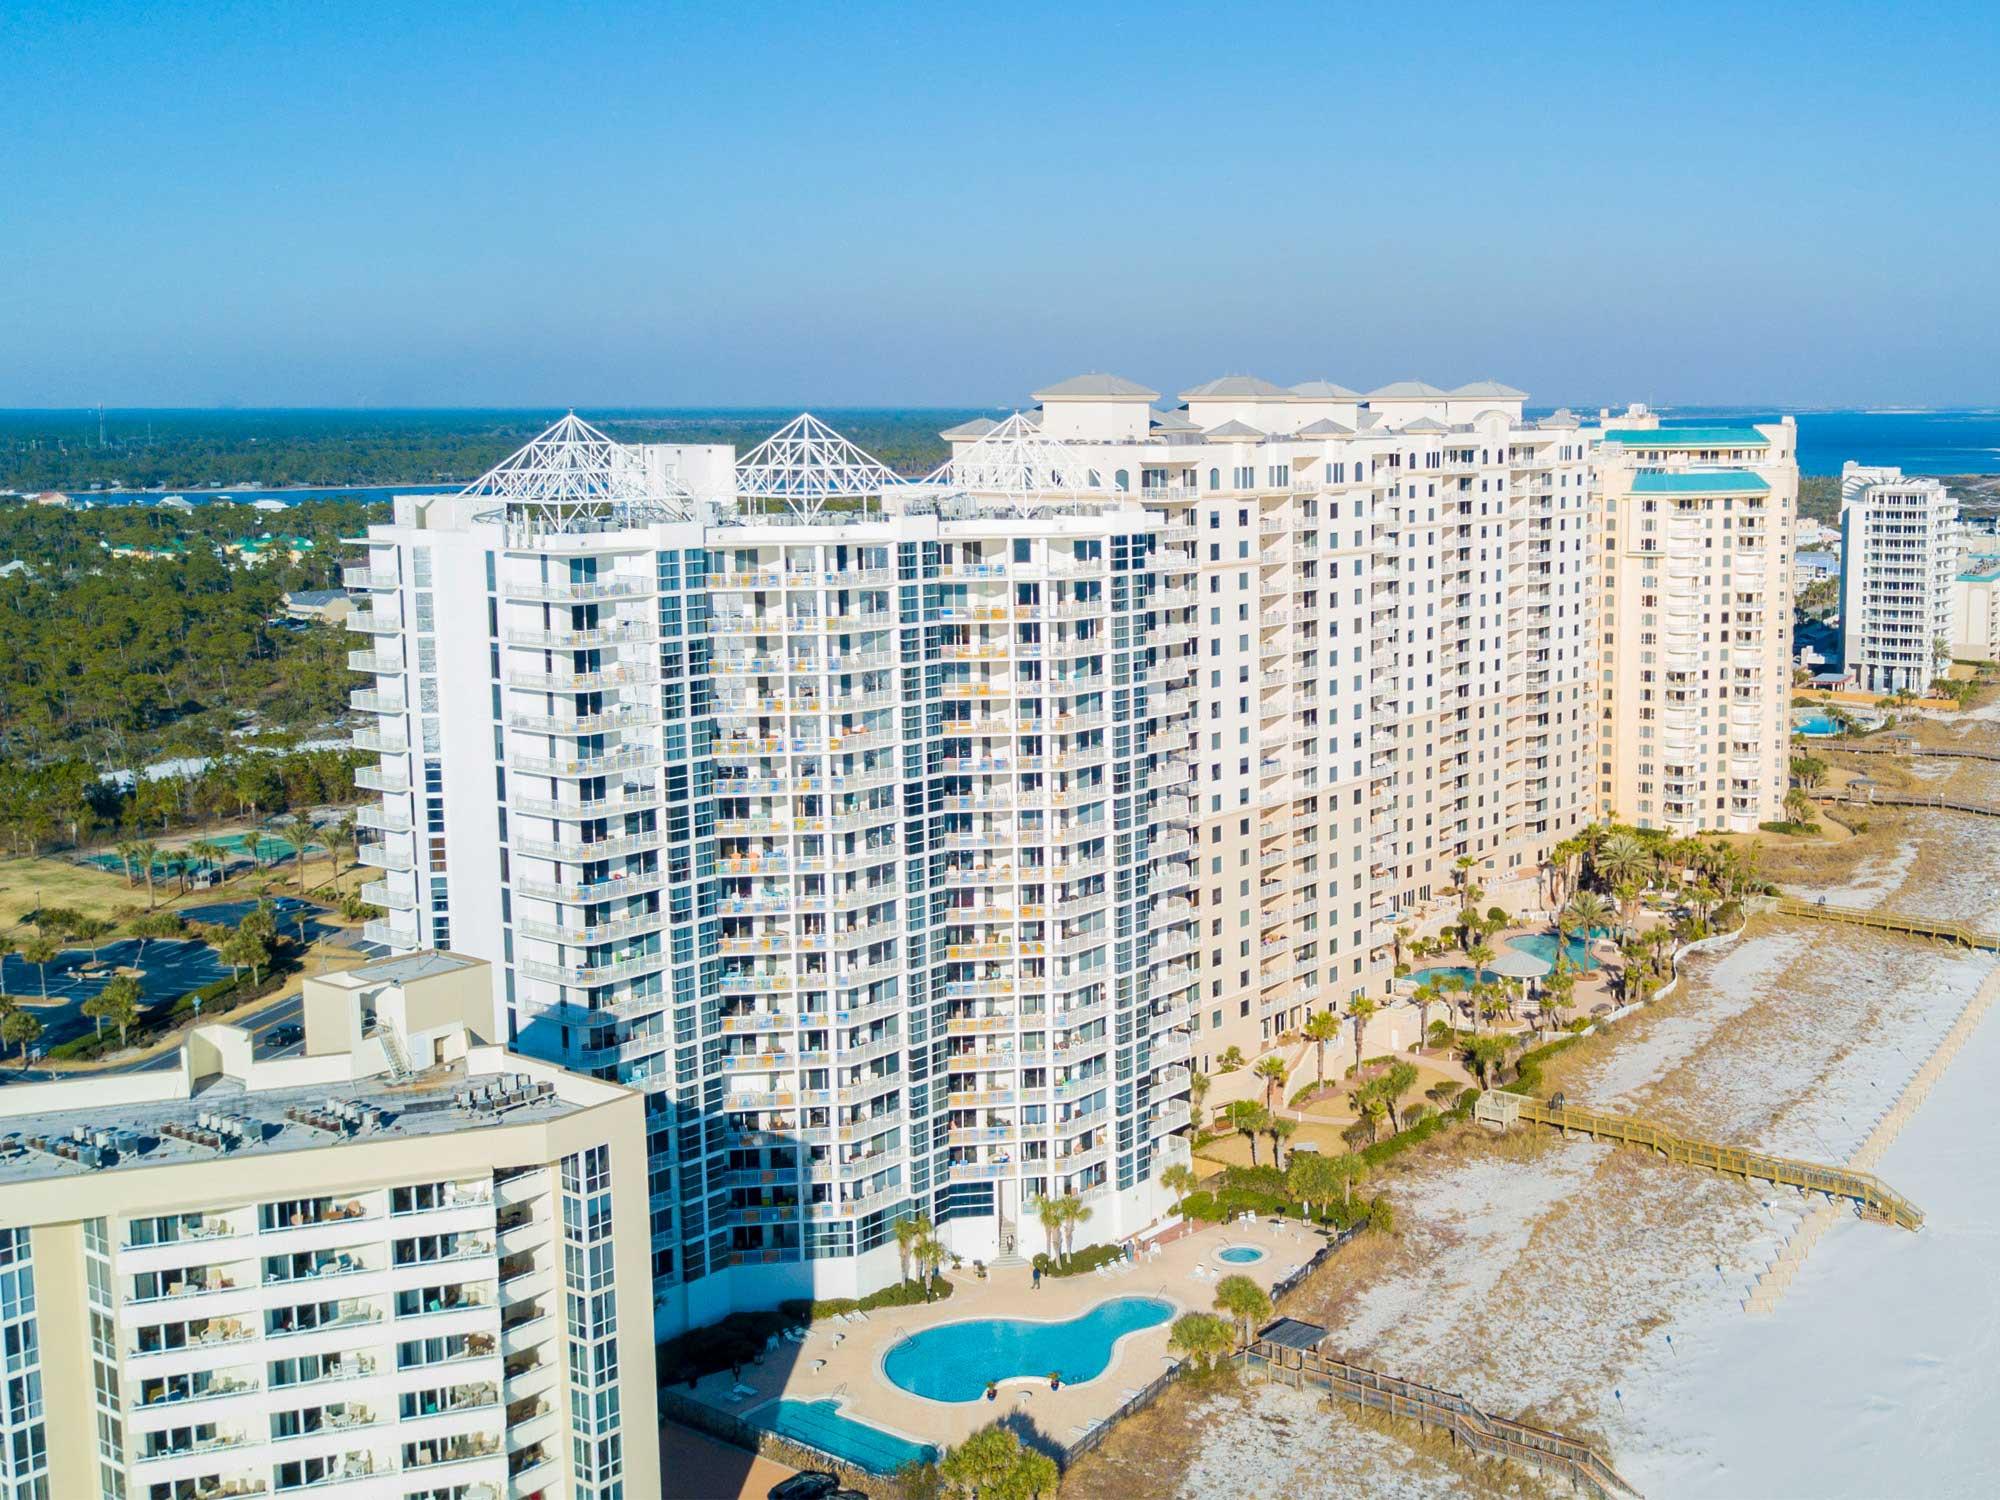 Resort Florida Key Palacio Perdido